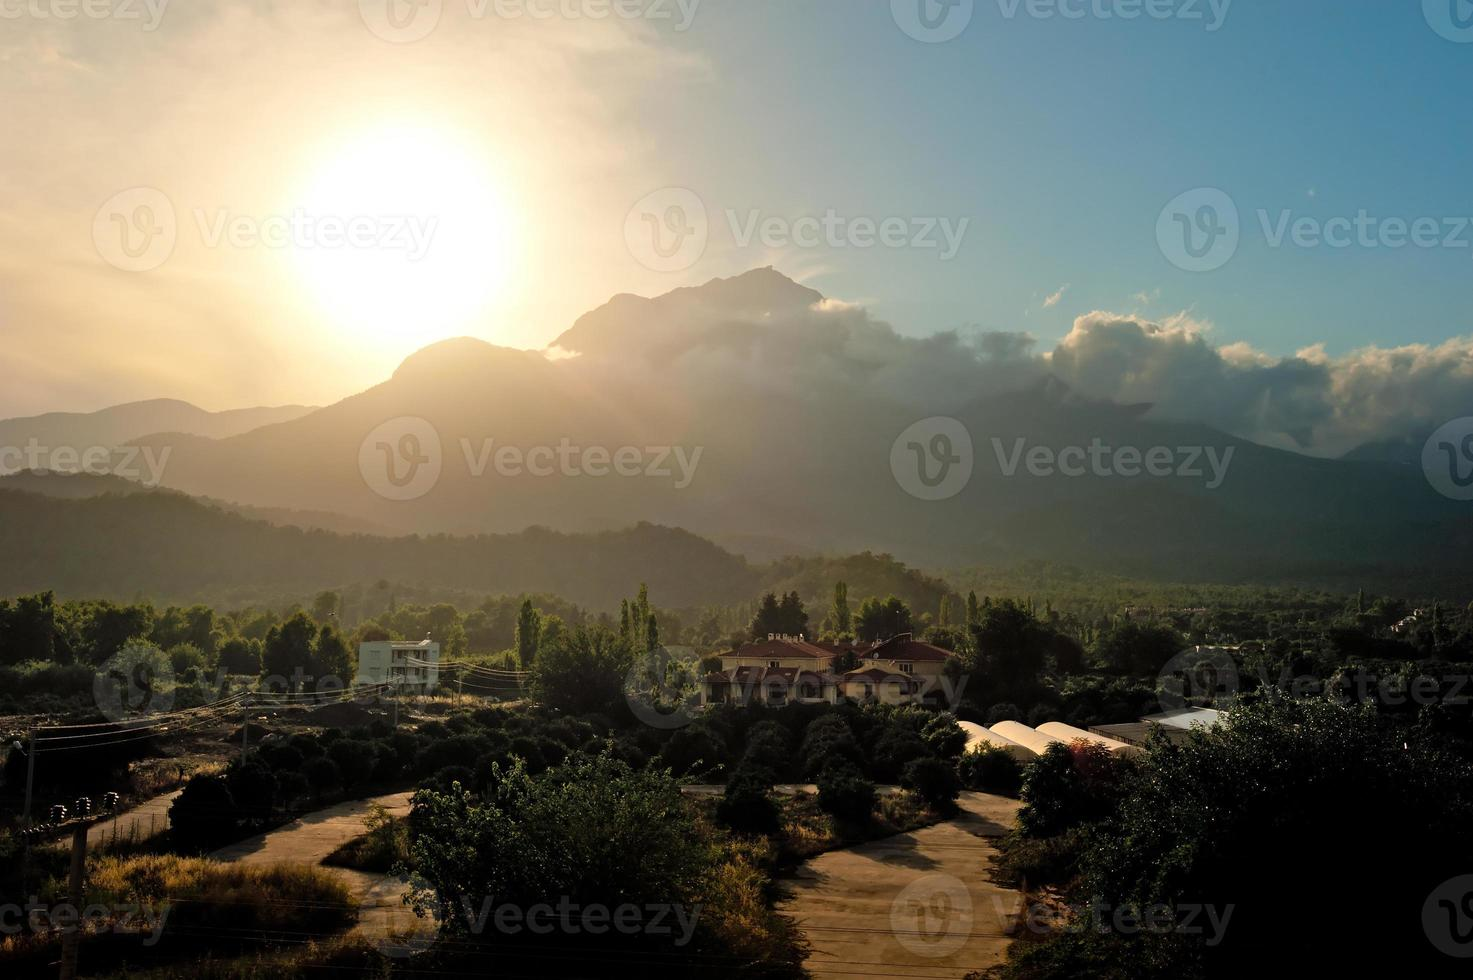 tramonto sopra la montagna tahtali in Turchia foto